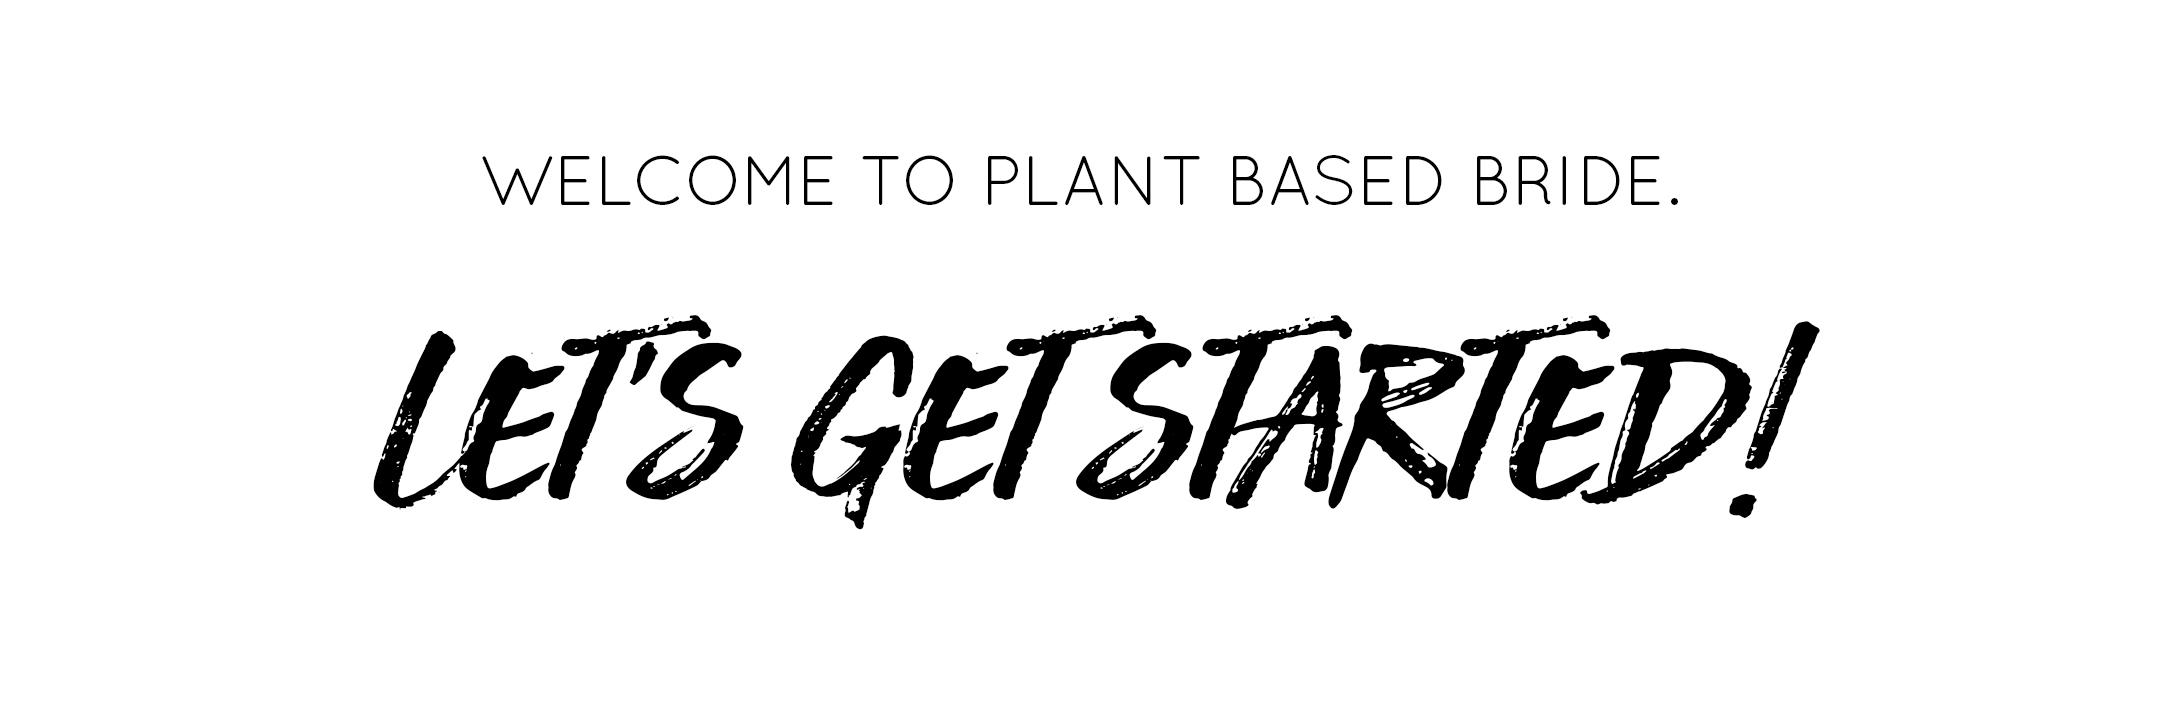 Let's get started on your plant based journey! // Plant Based Bride